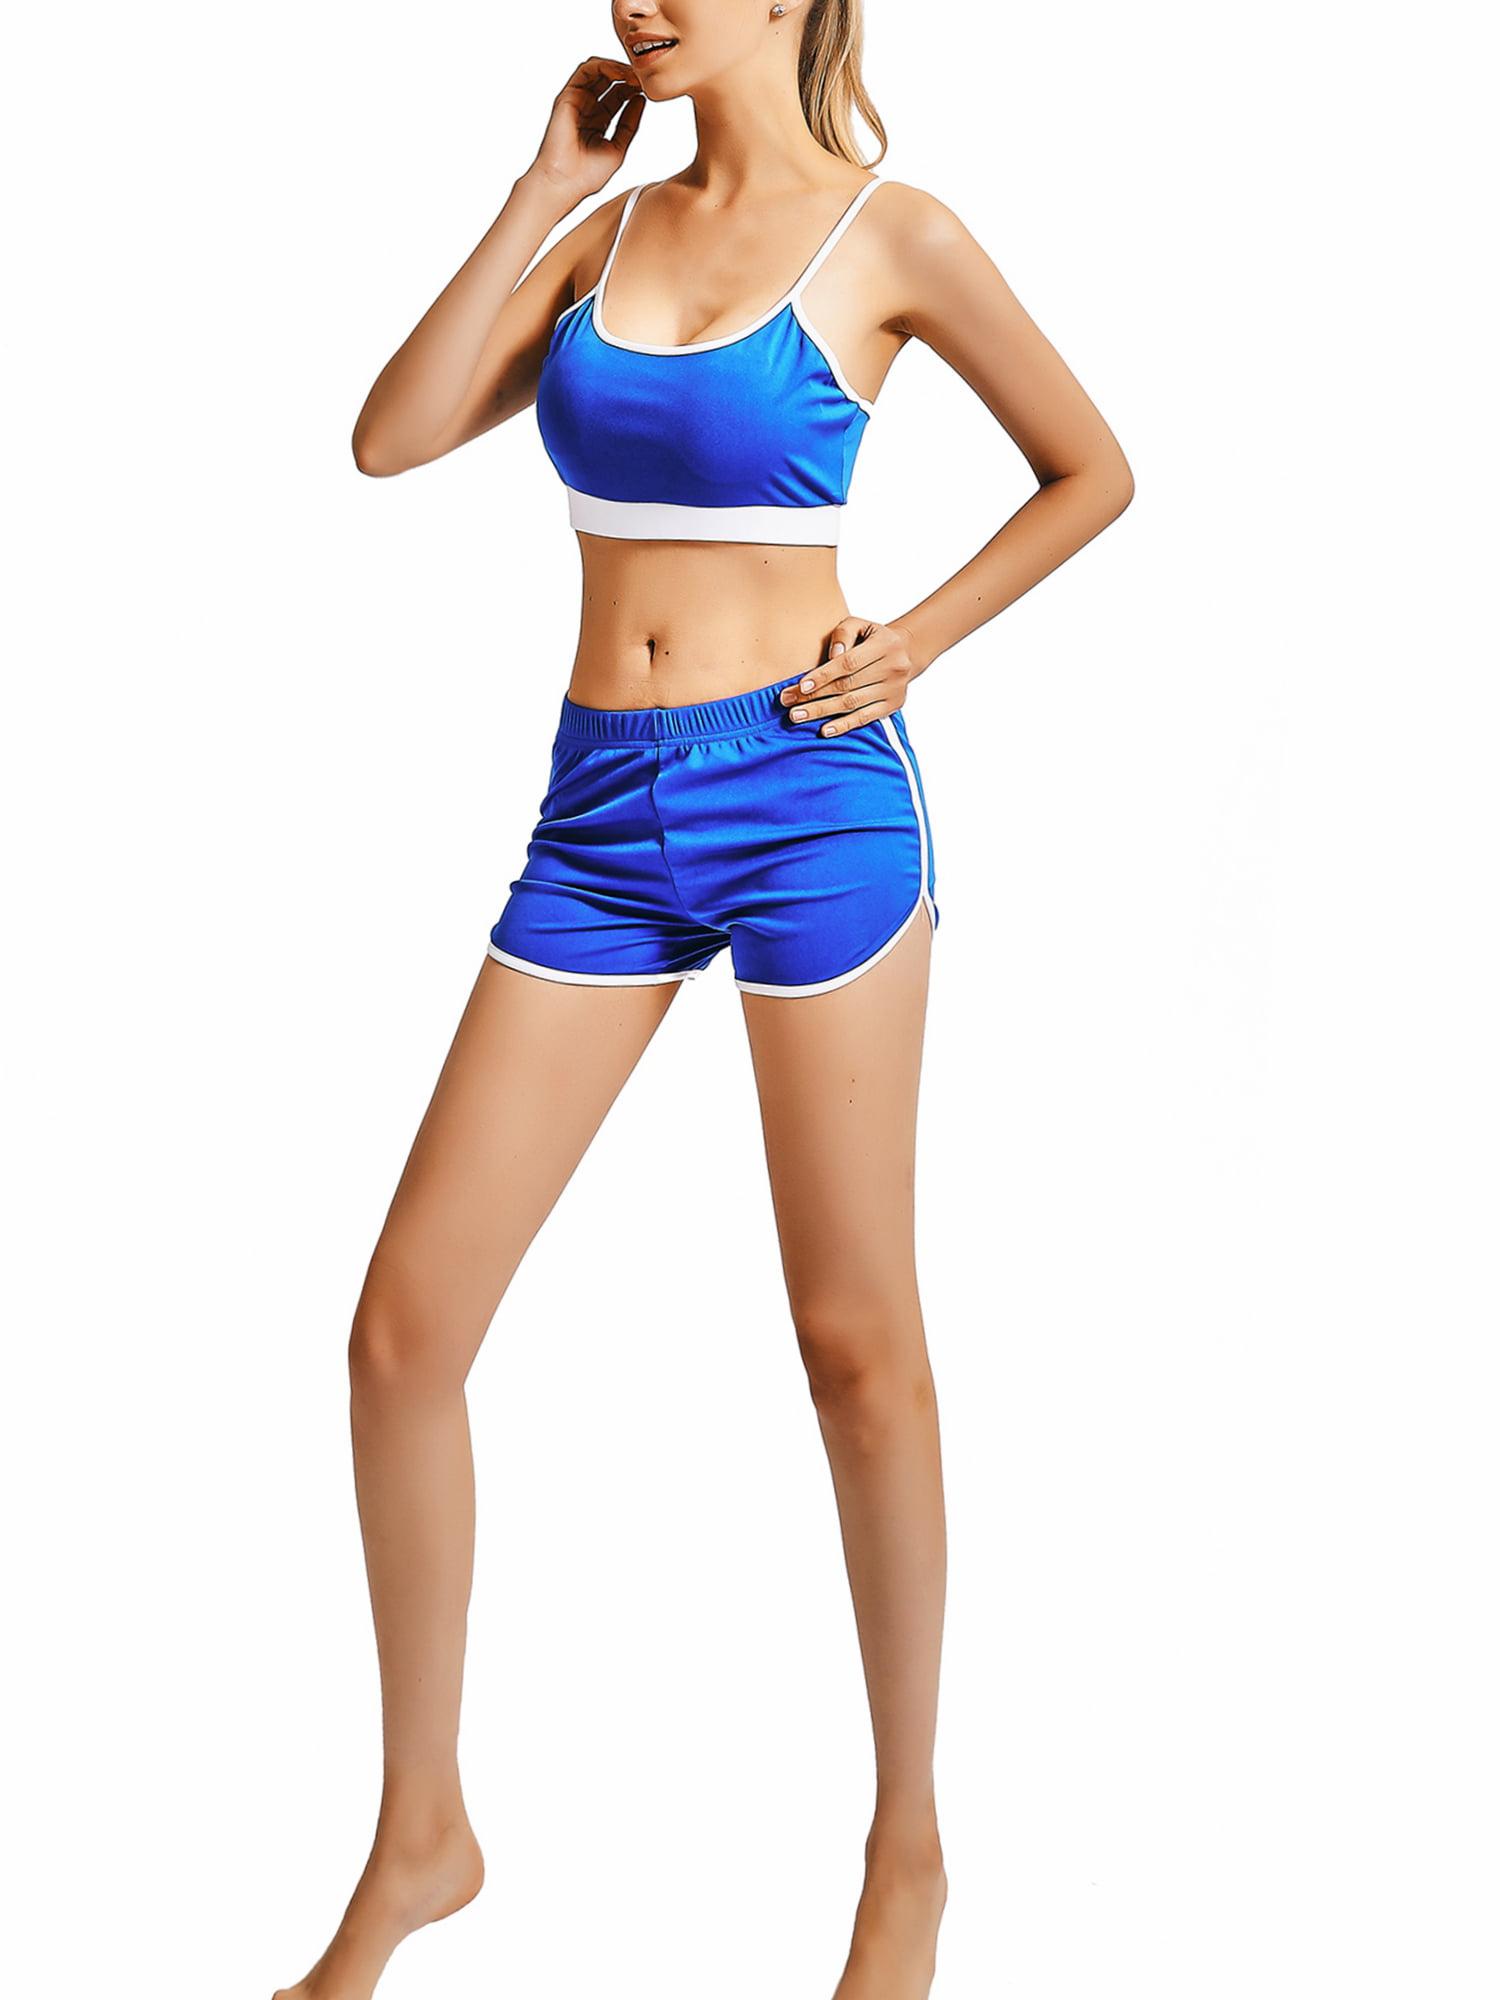 SportsX Womens Premium Fitness Stretch Active Workout Midi Shorts